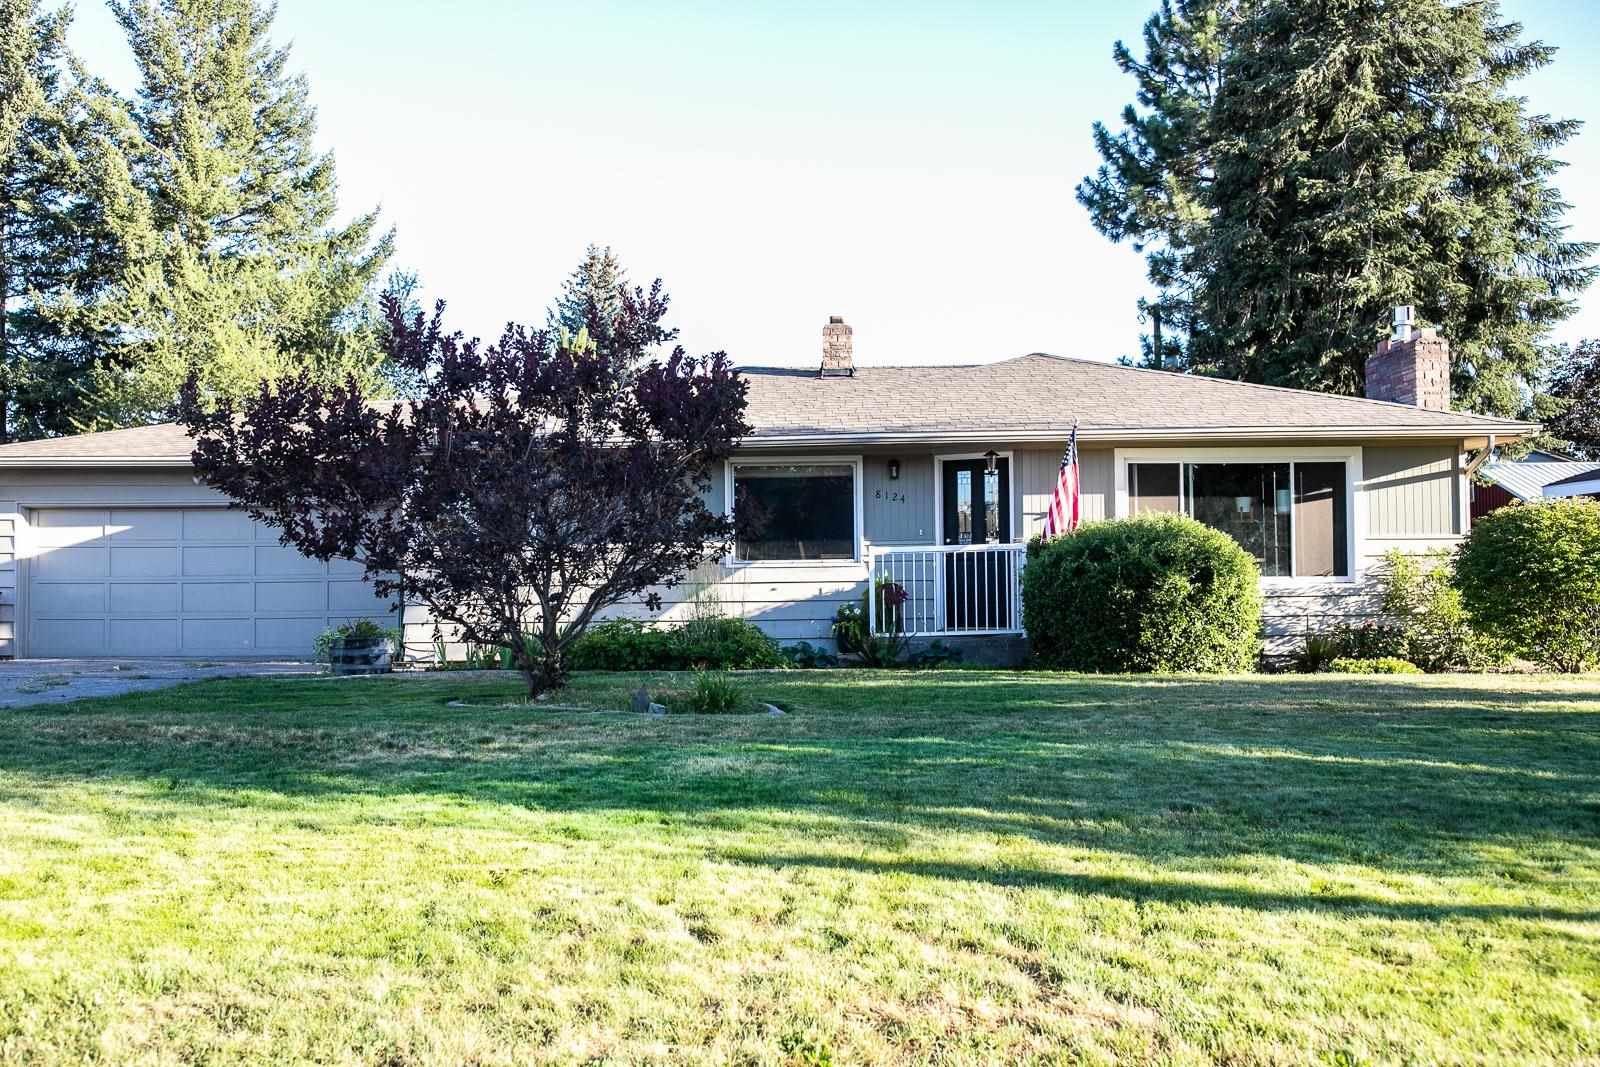 8124 E Boone Ave, Spokane Valley, WA 99212 - #: 202119104